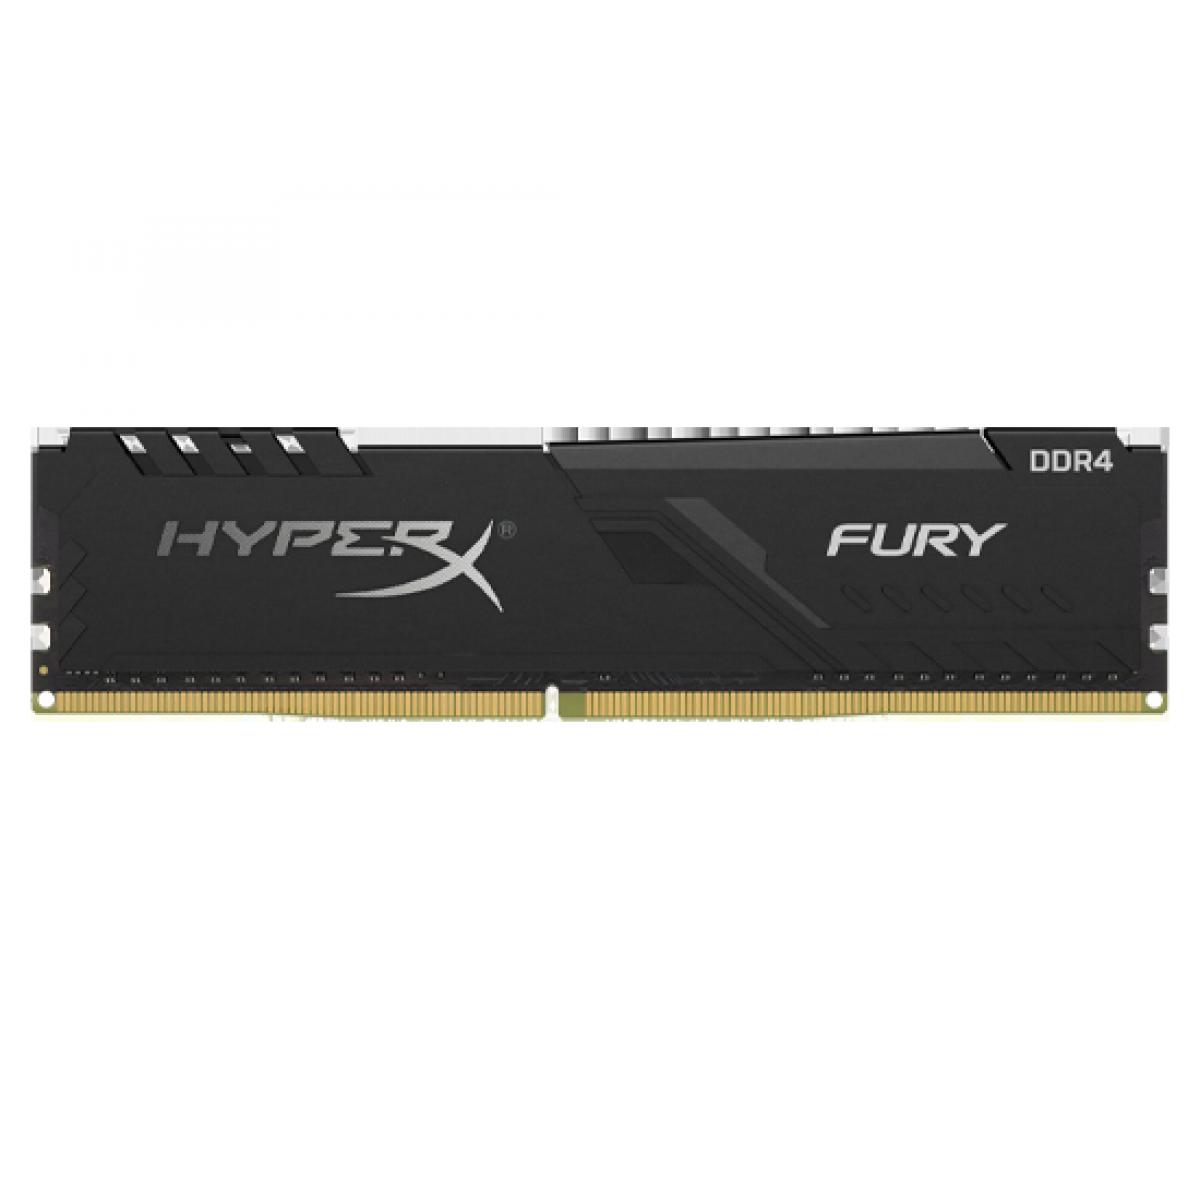 Memória DDR4 Kingston HyperX Fury, 16GB 3466MHz, Black, HX434C16FB3/16